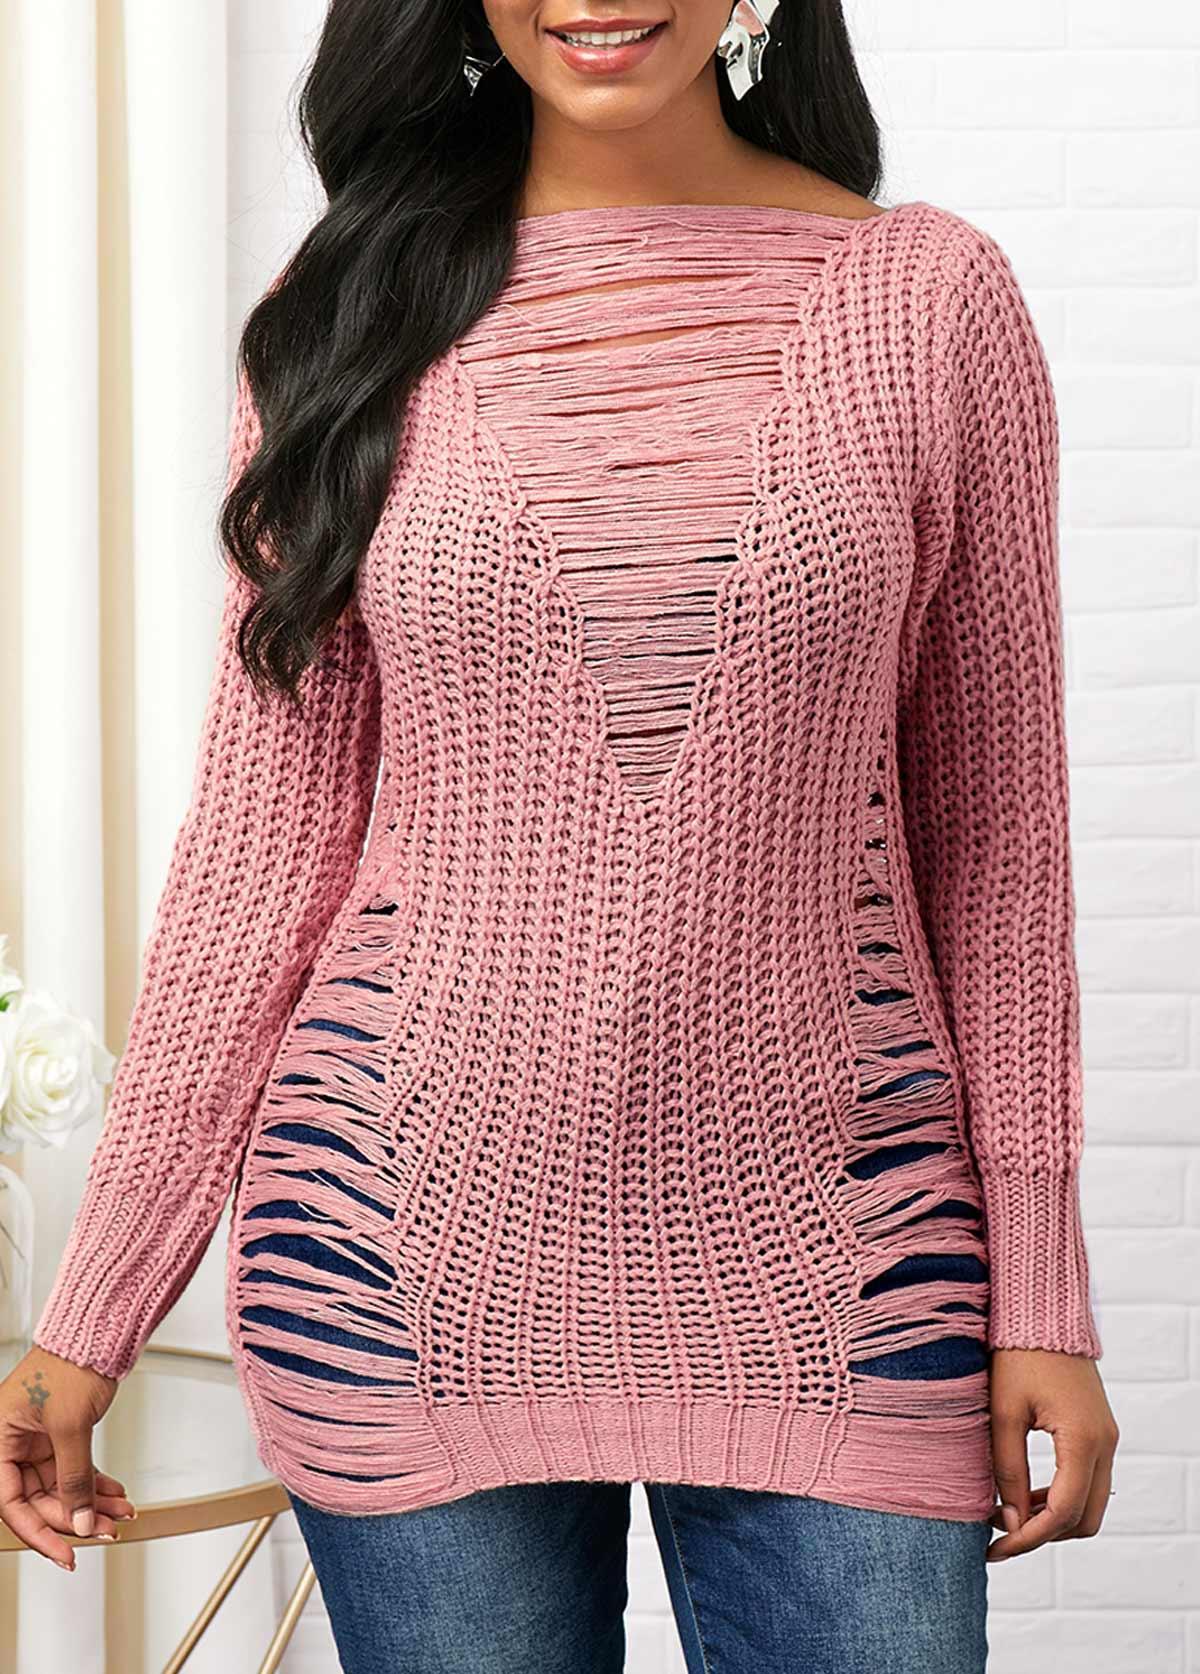 Long Sleeve Shredded Peach Pink Sweater